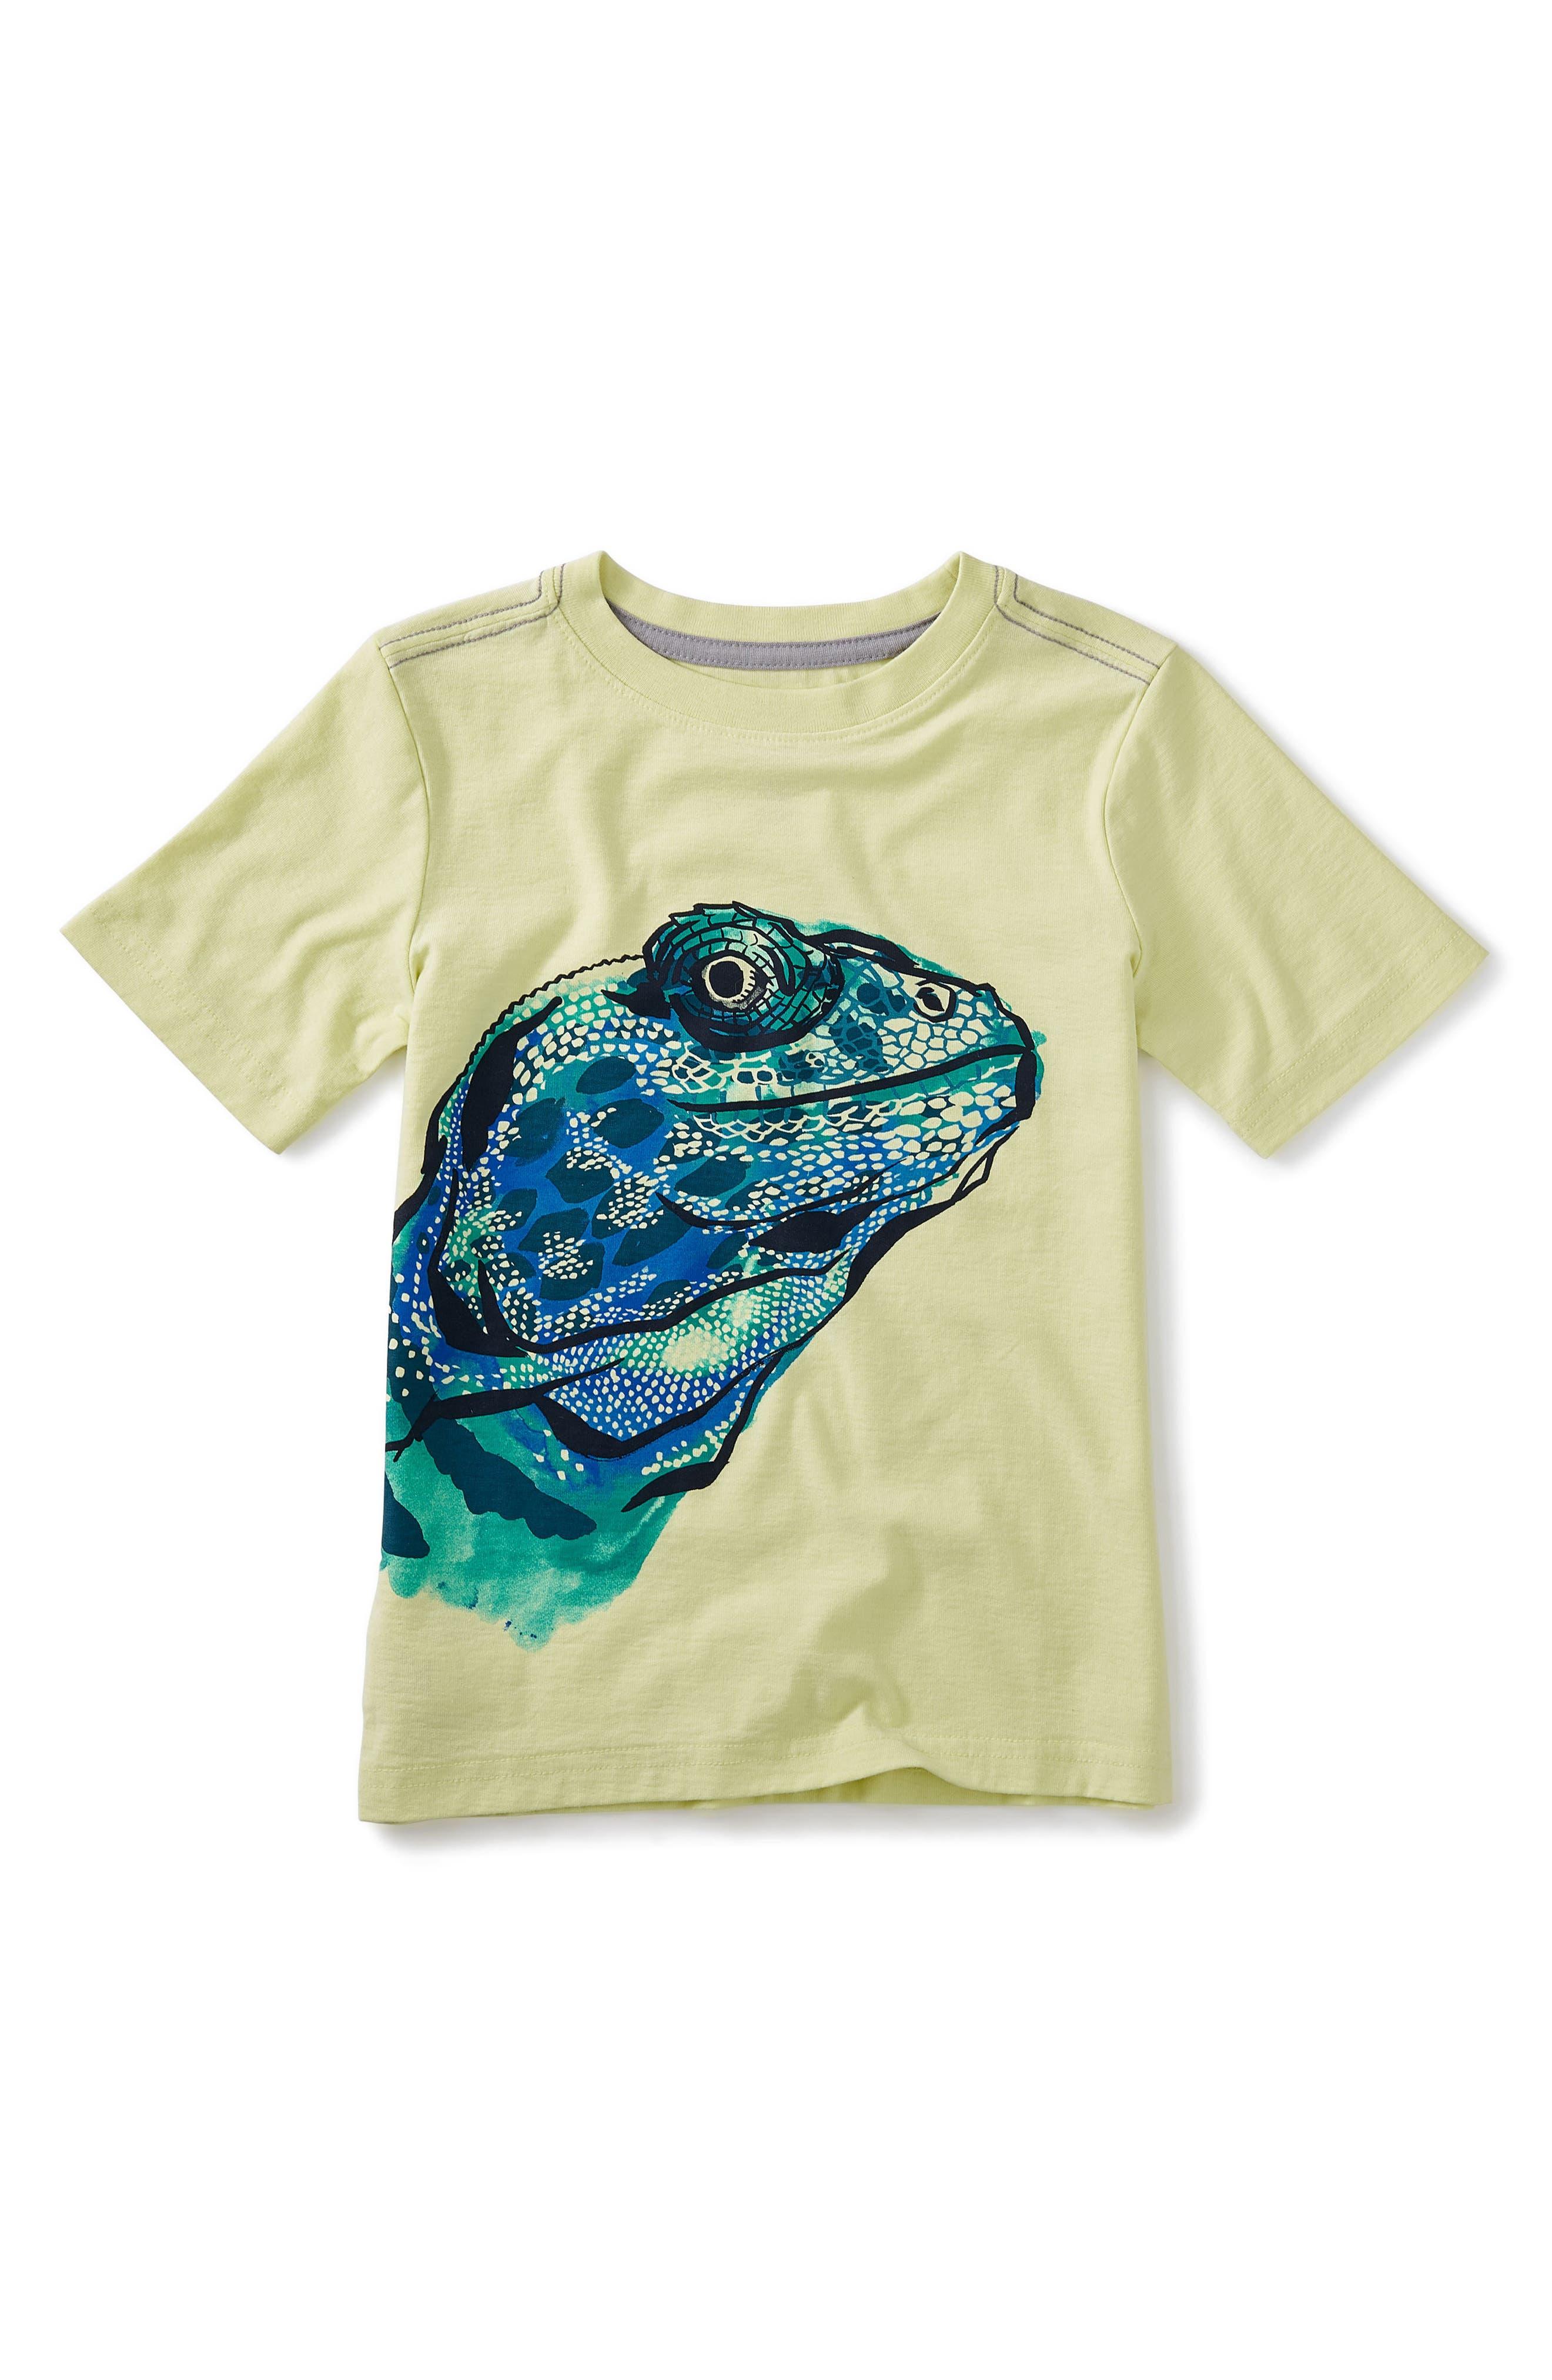 Lizard Graphic T-Shirt,                             Main thumbnail 1, color,                             771